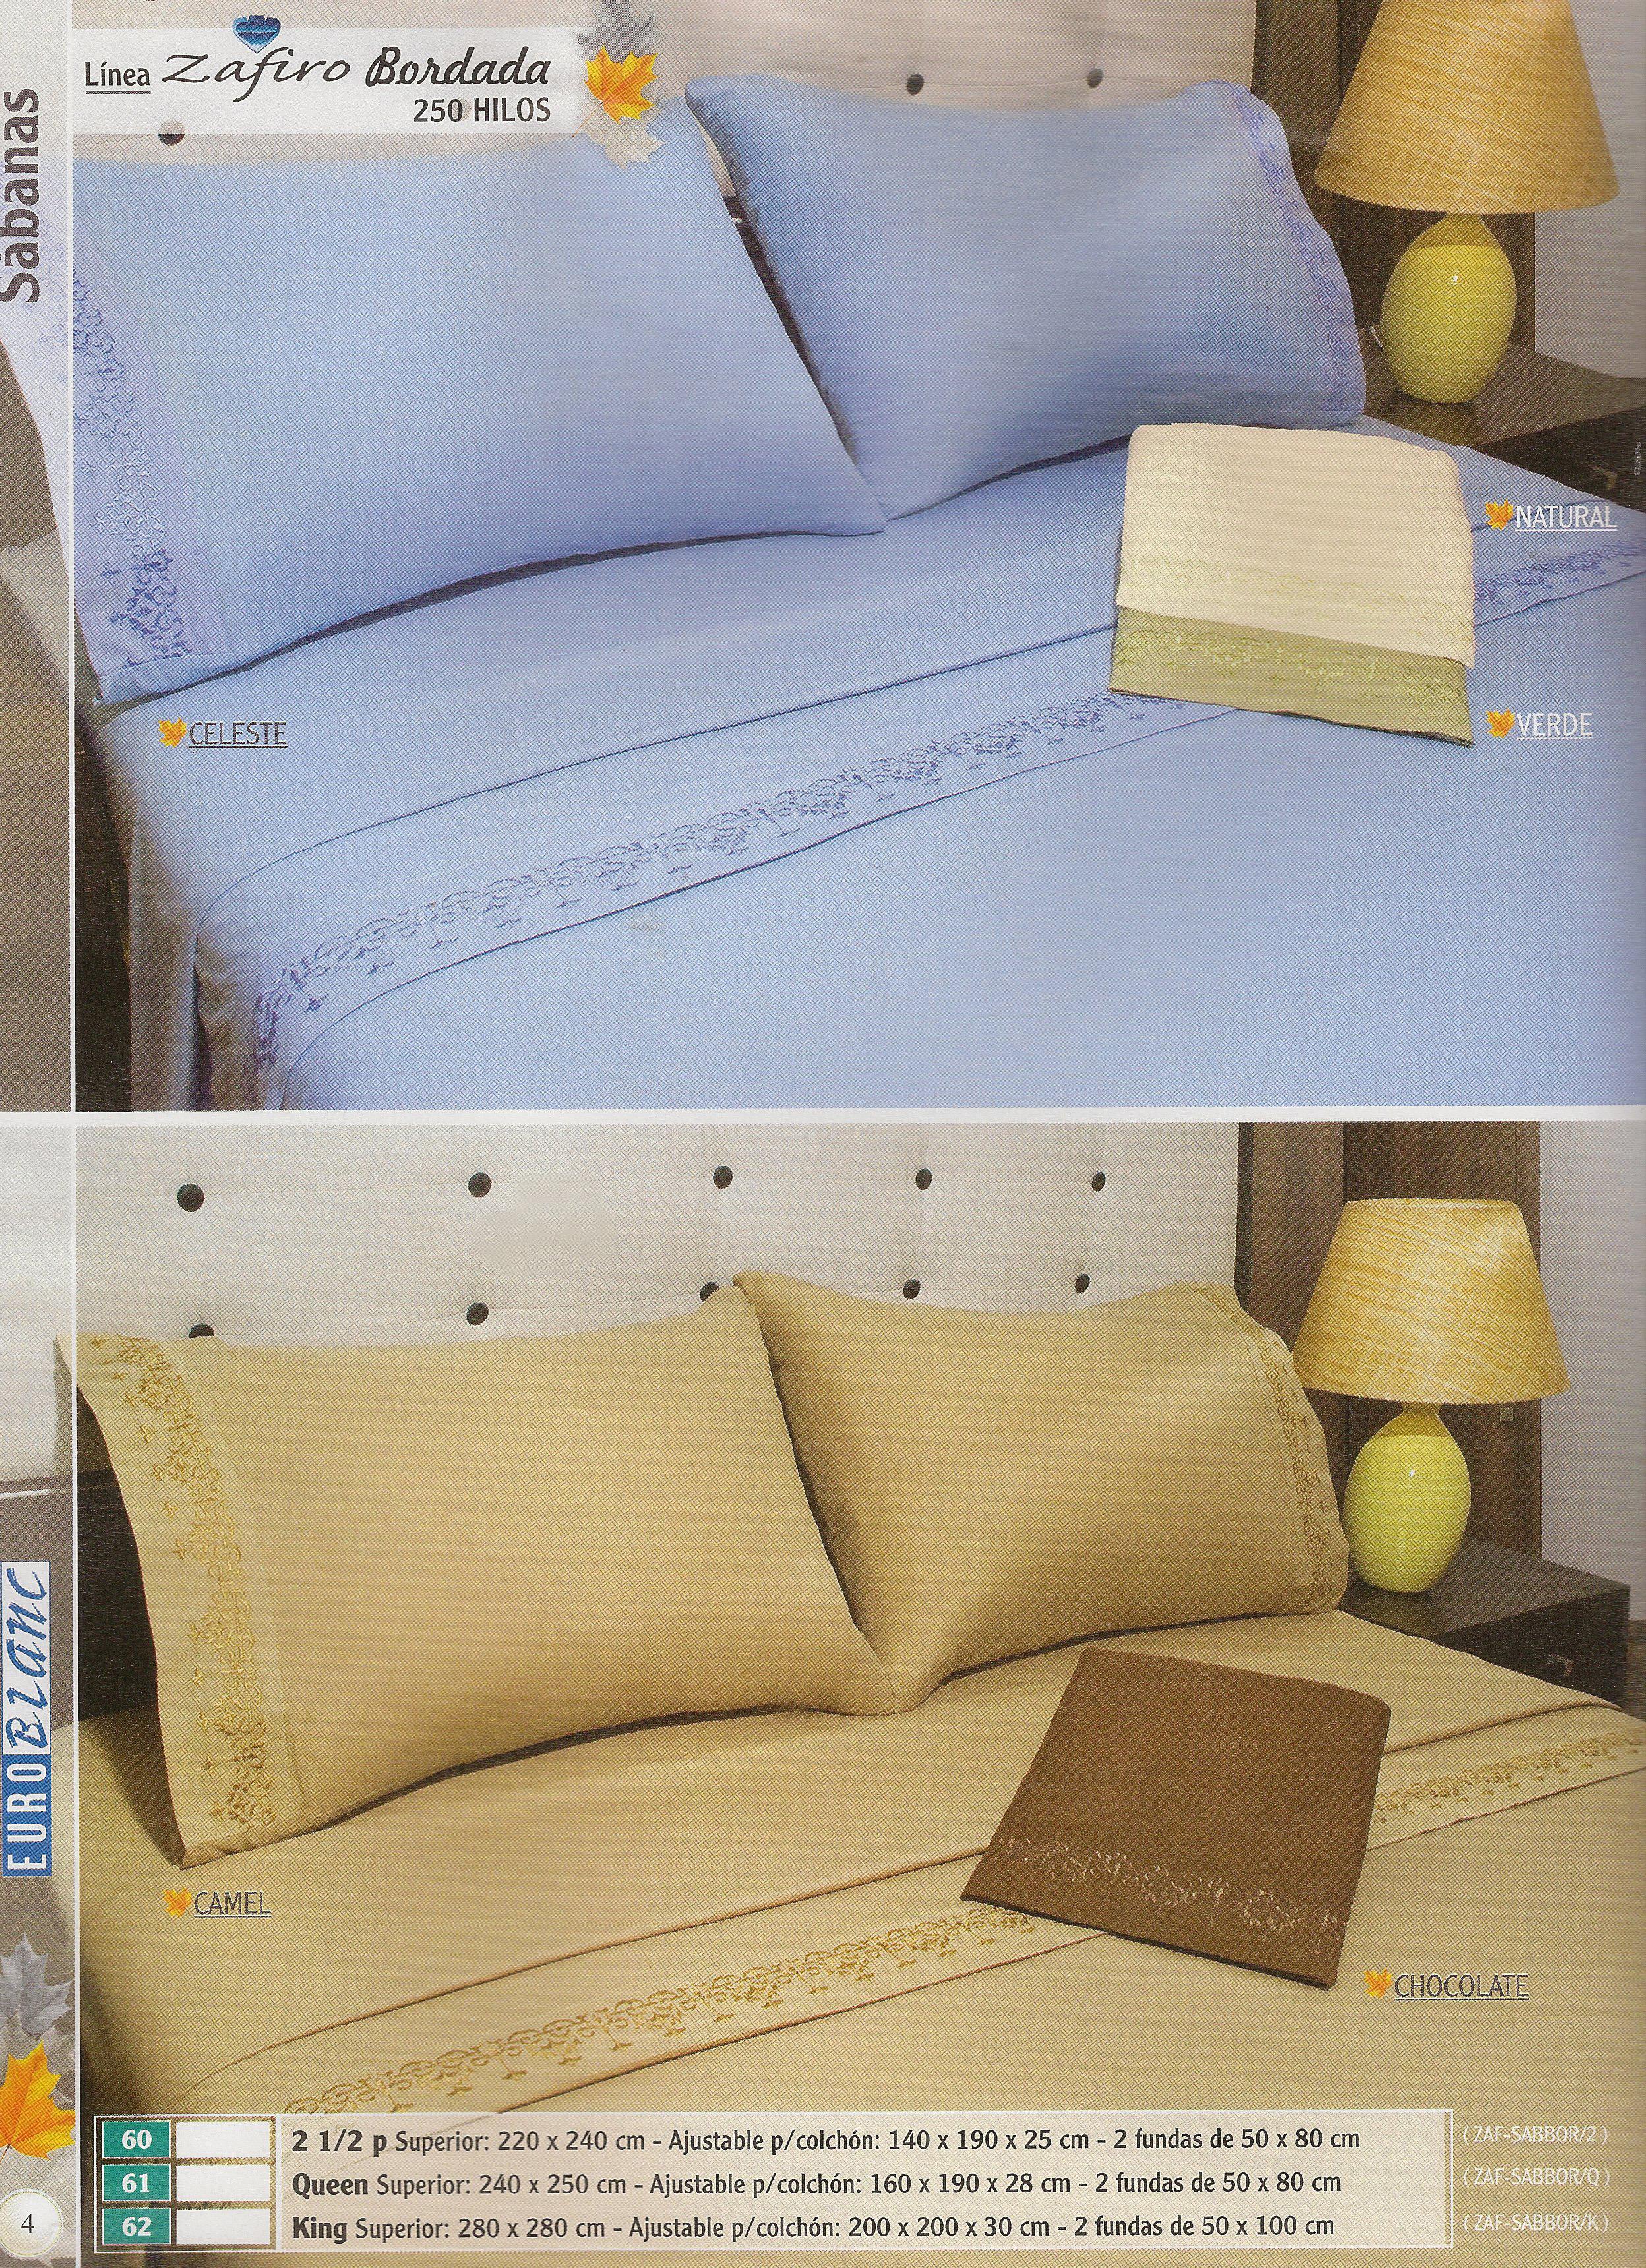 Linea zafiro bordada 250 hilos hogar muebles y jardin for Cama zafiro